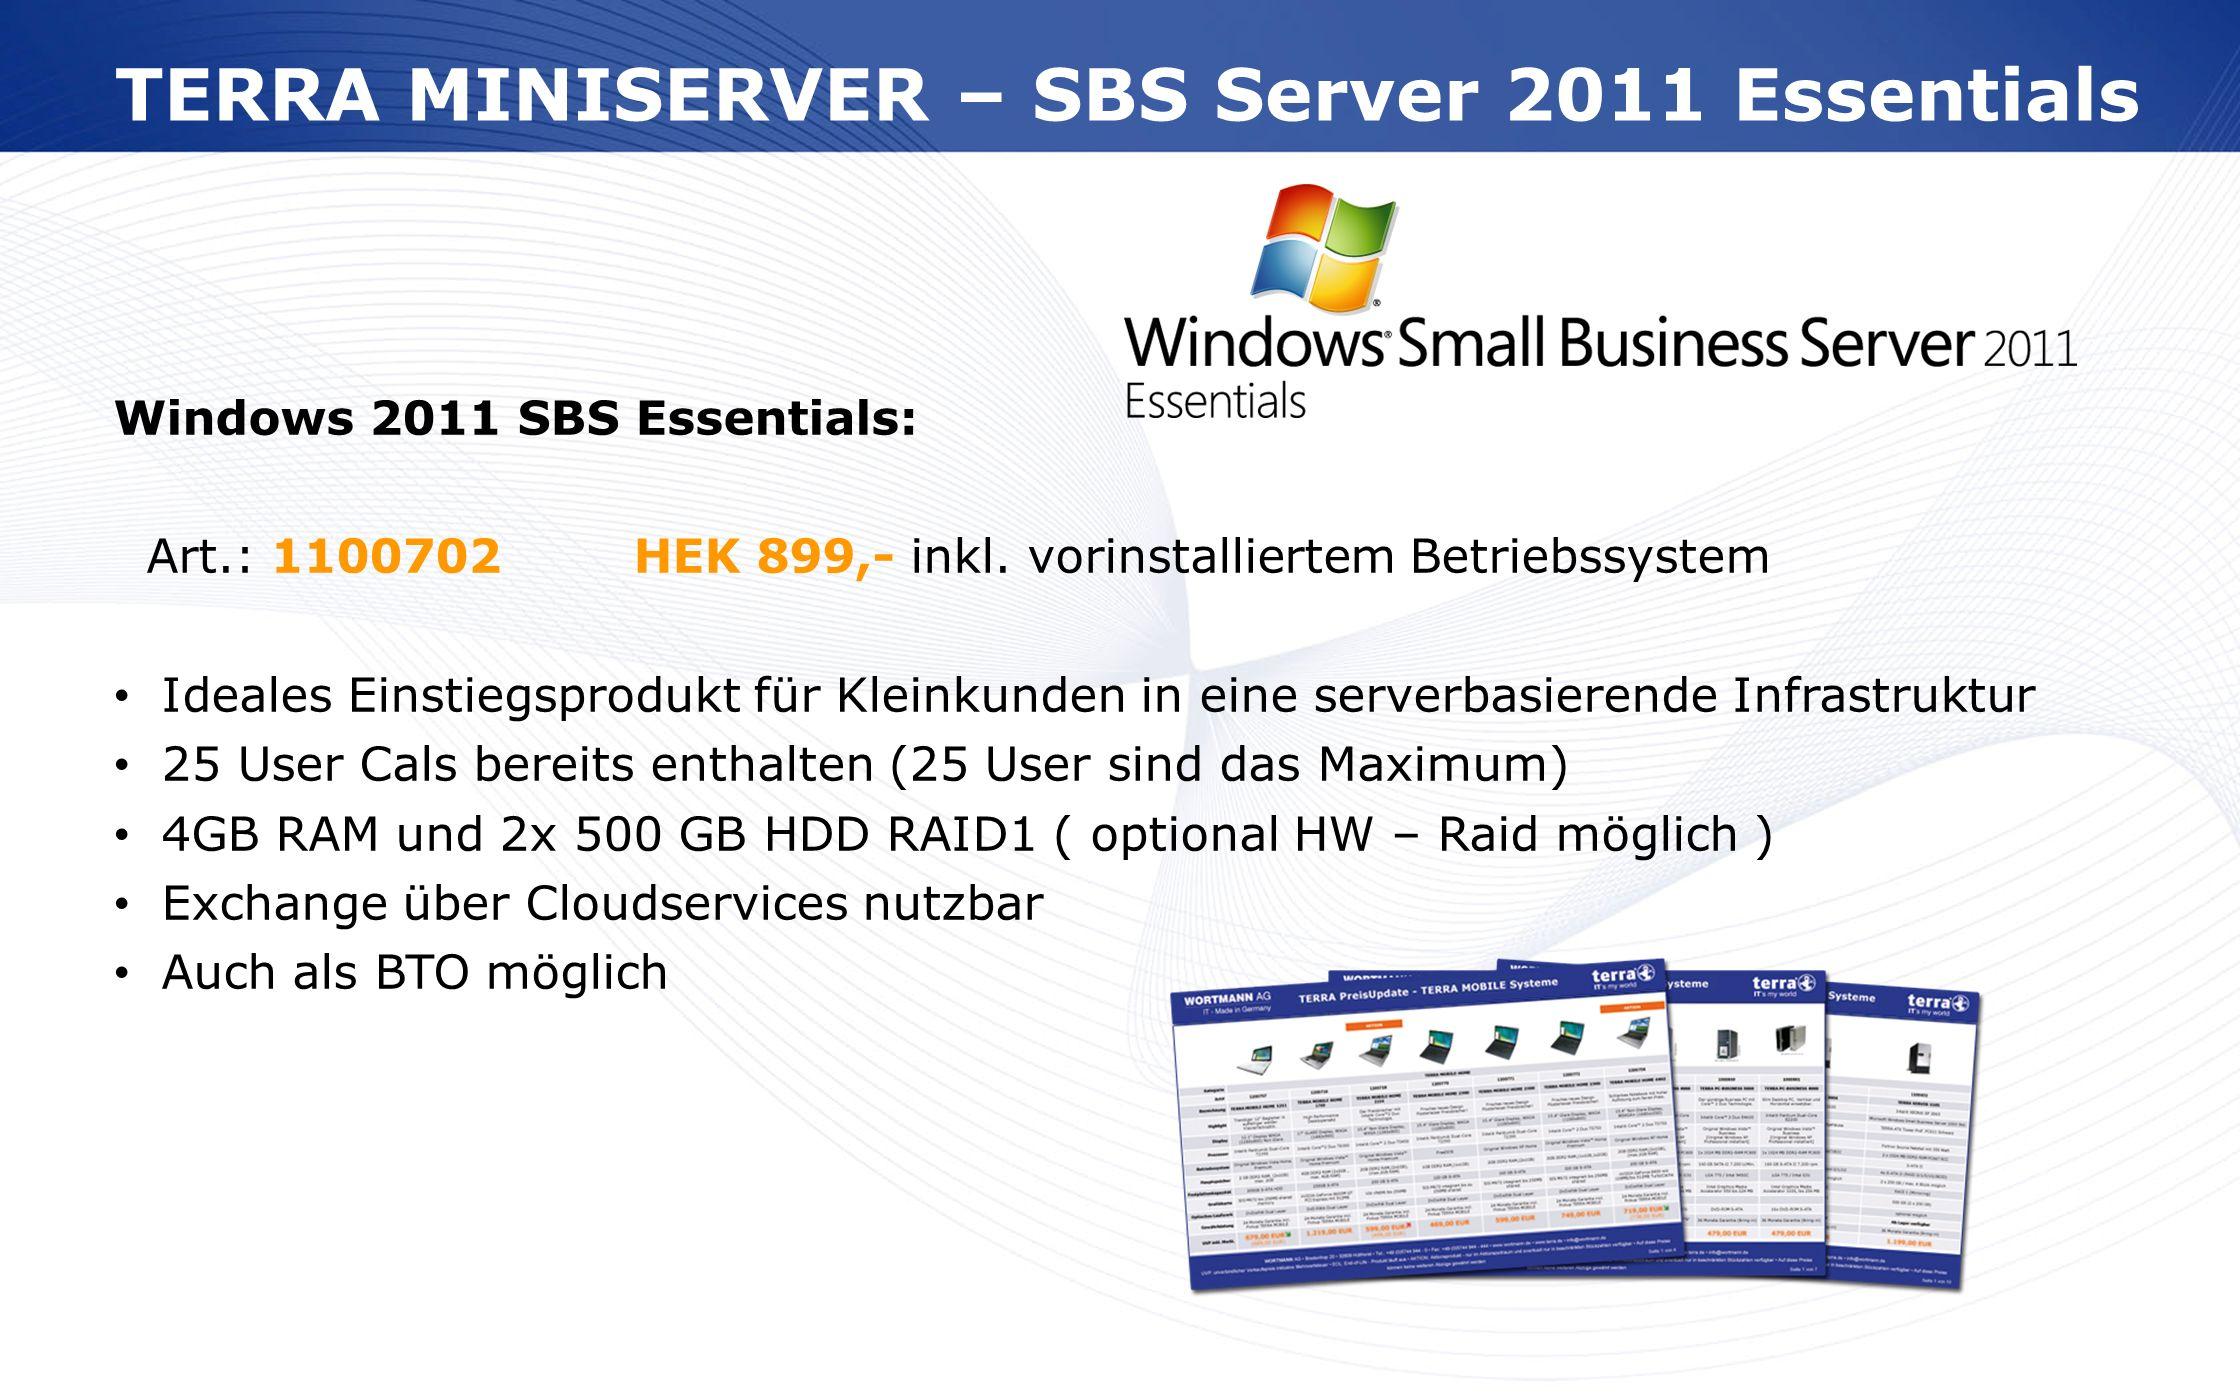 TERRA MINISERVER – SBS Server 2011 Essentials